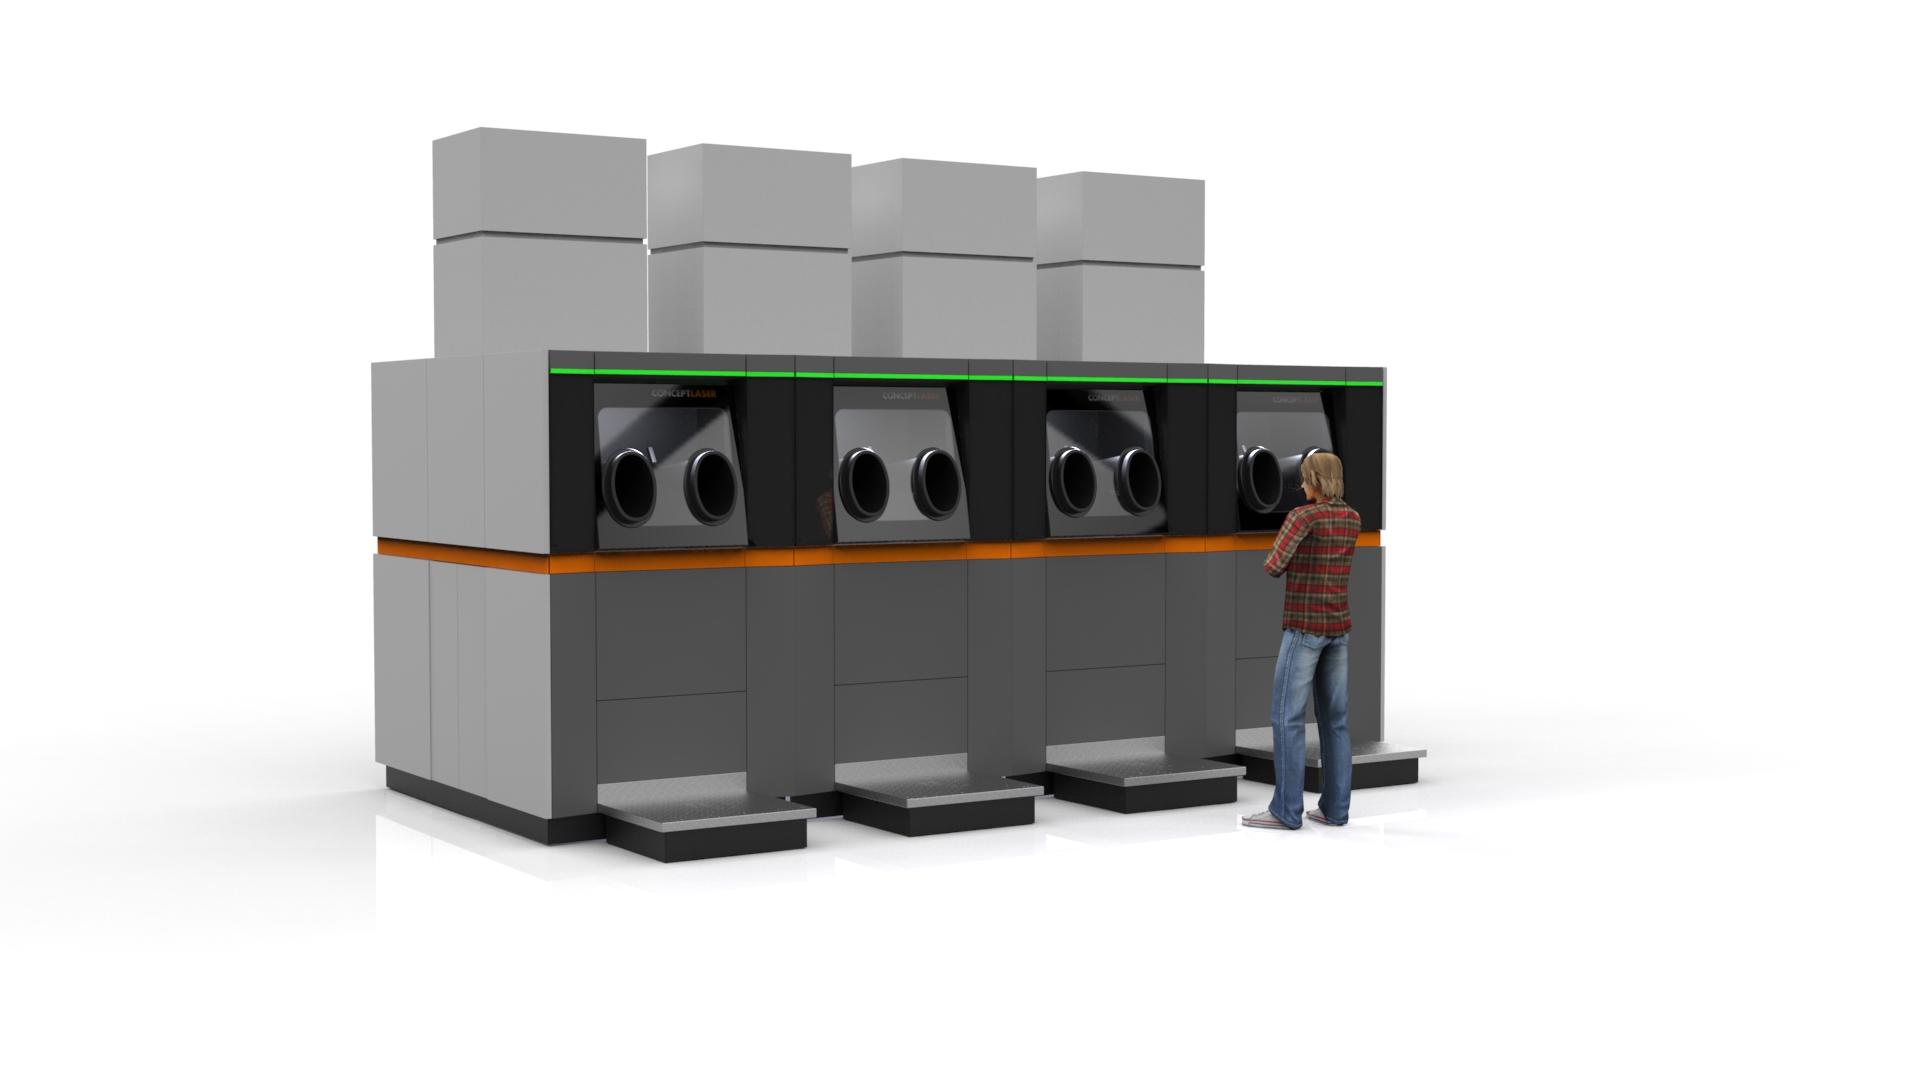 Concept Laser Factory5